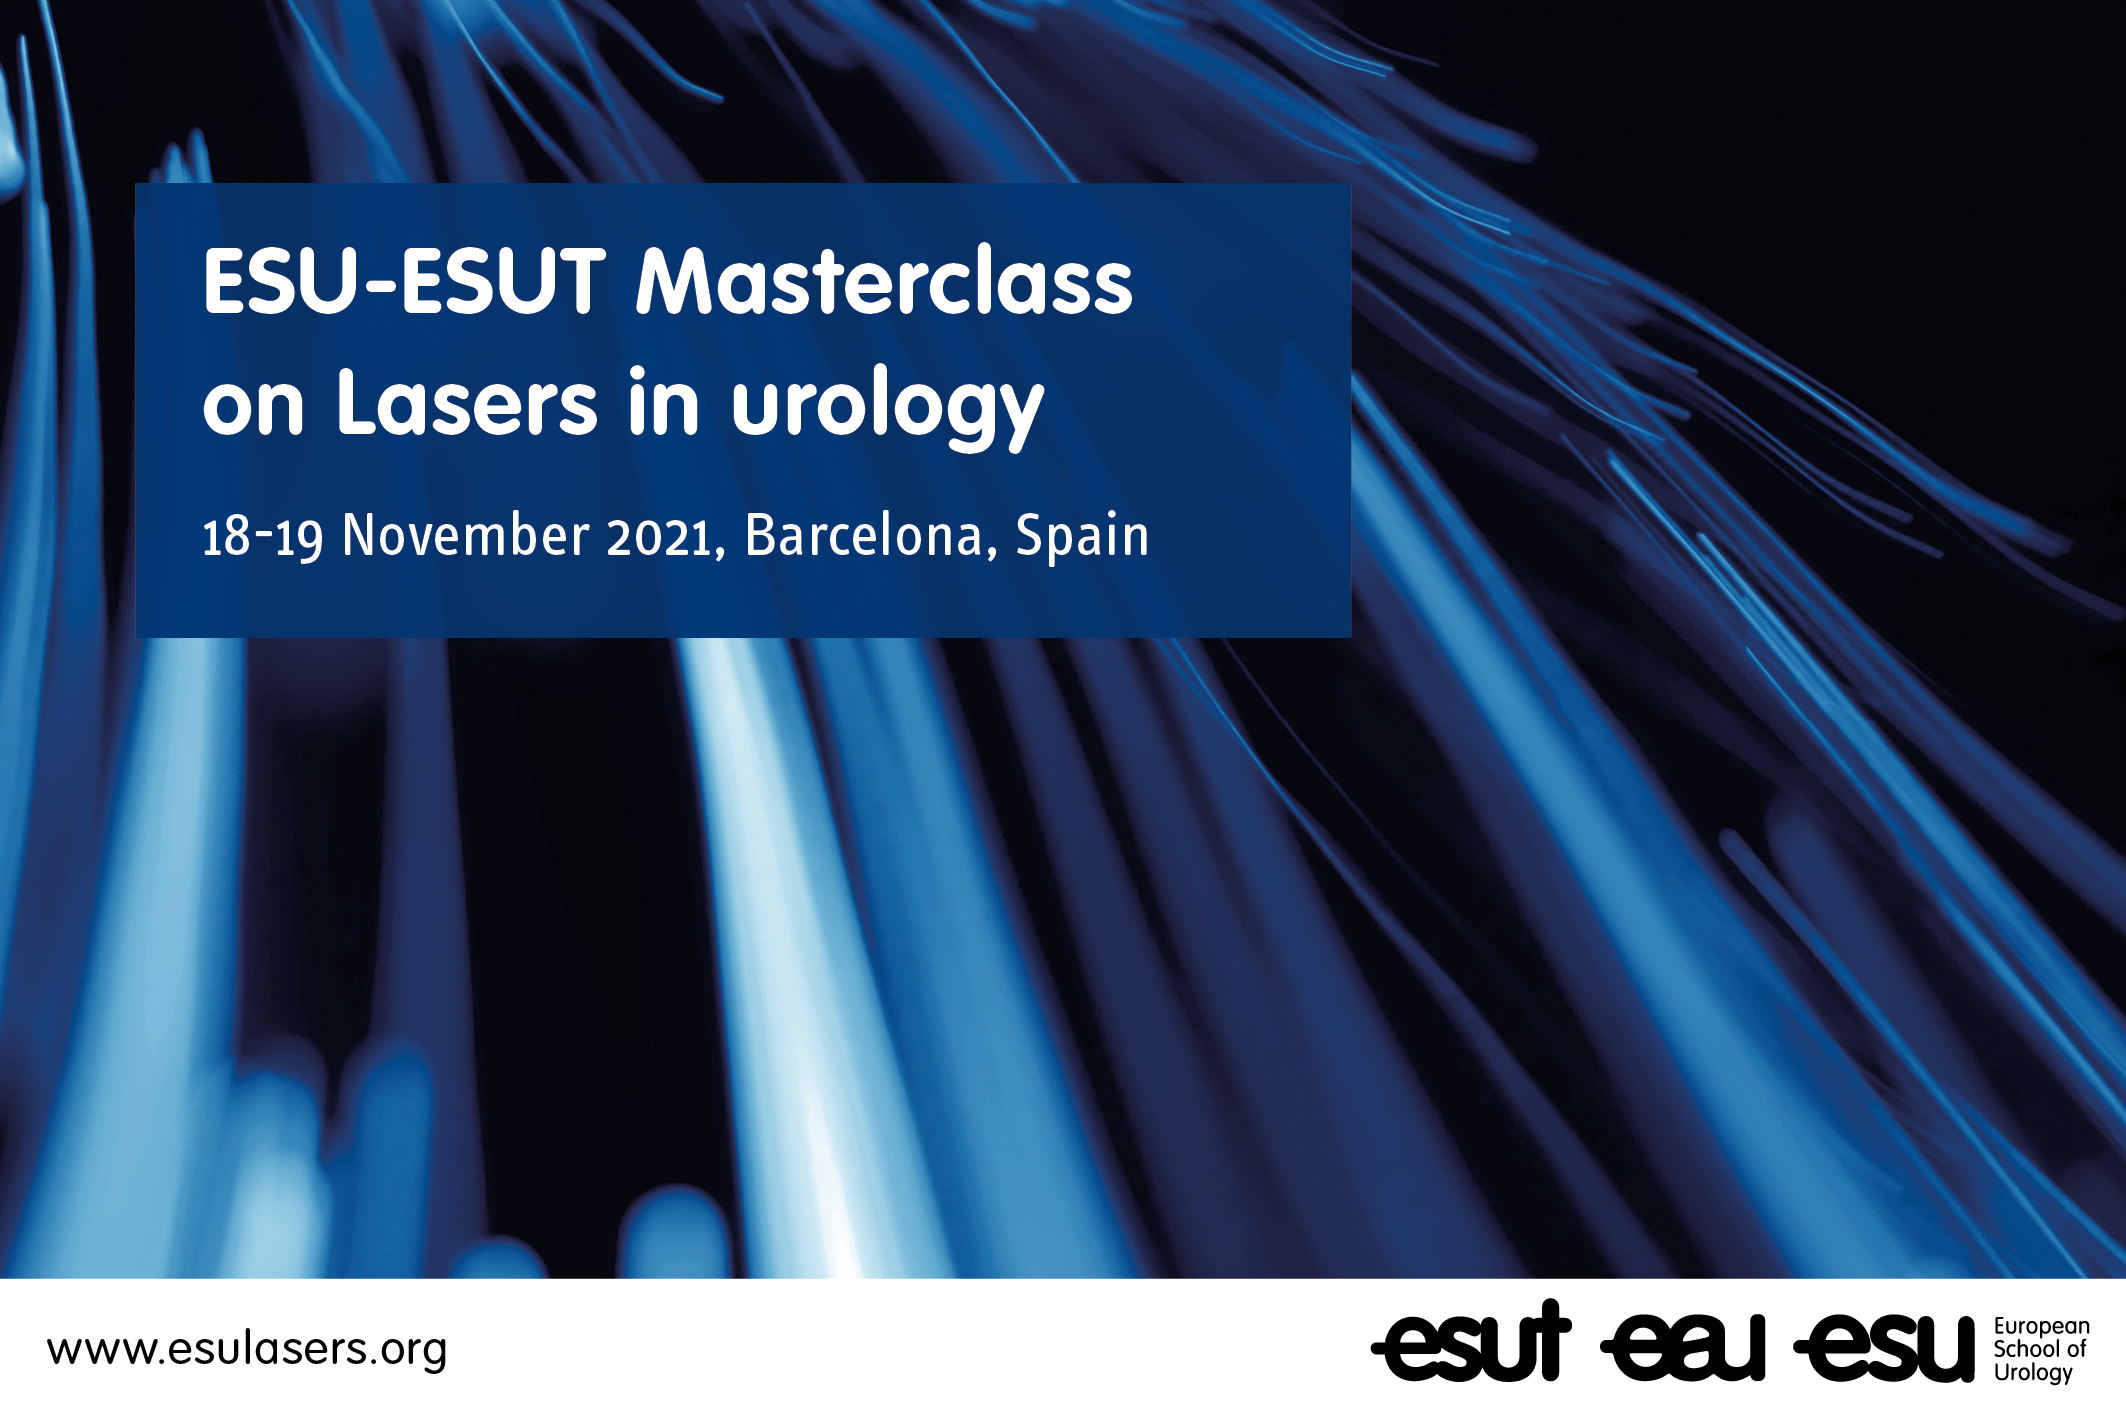 ESU-ESUT masterclass on lasers in urology